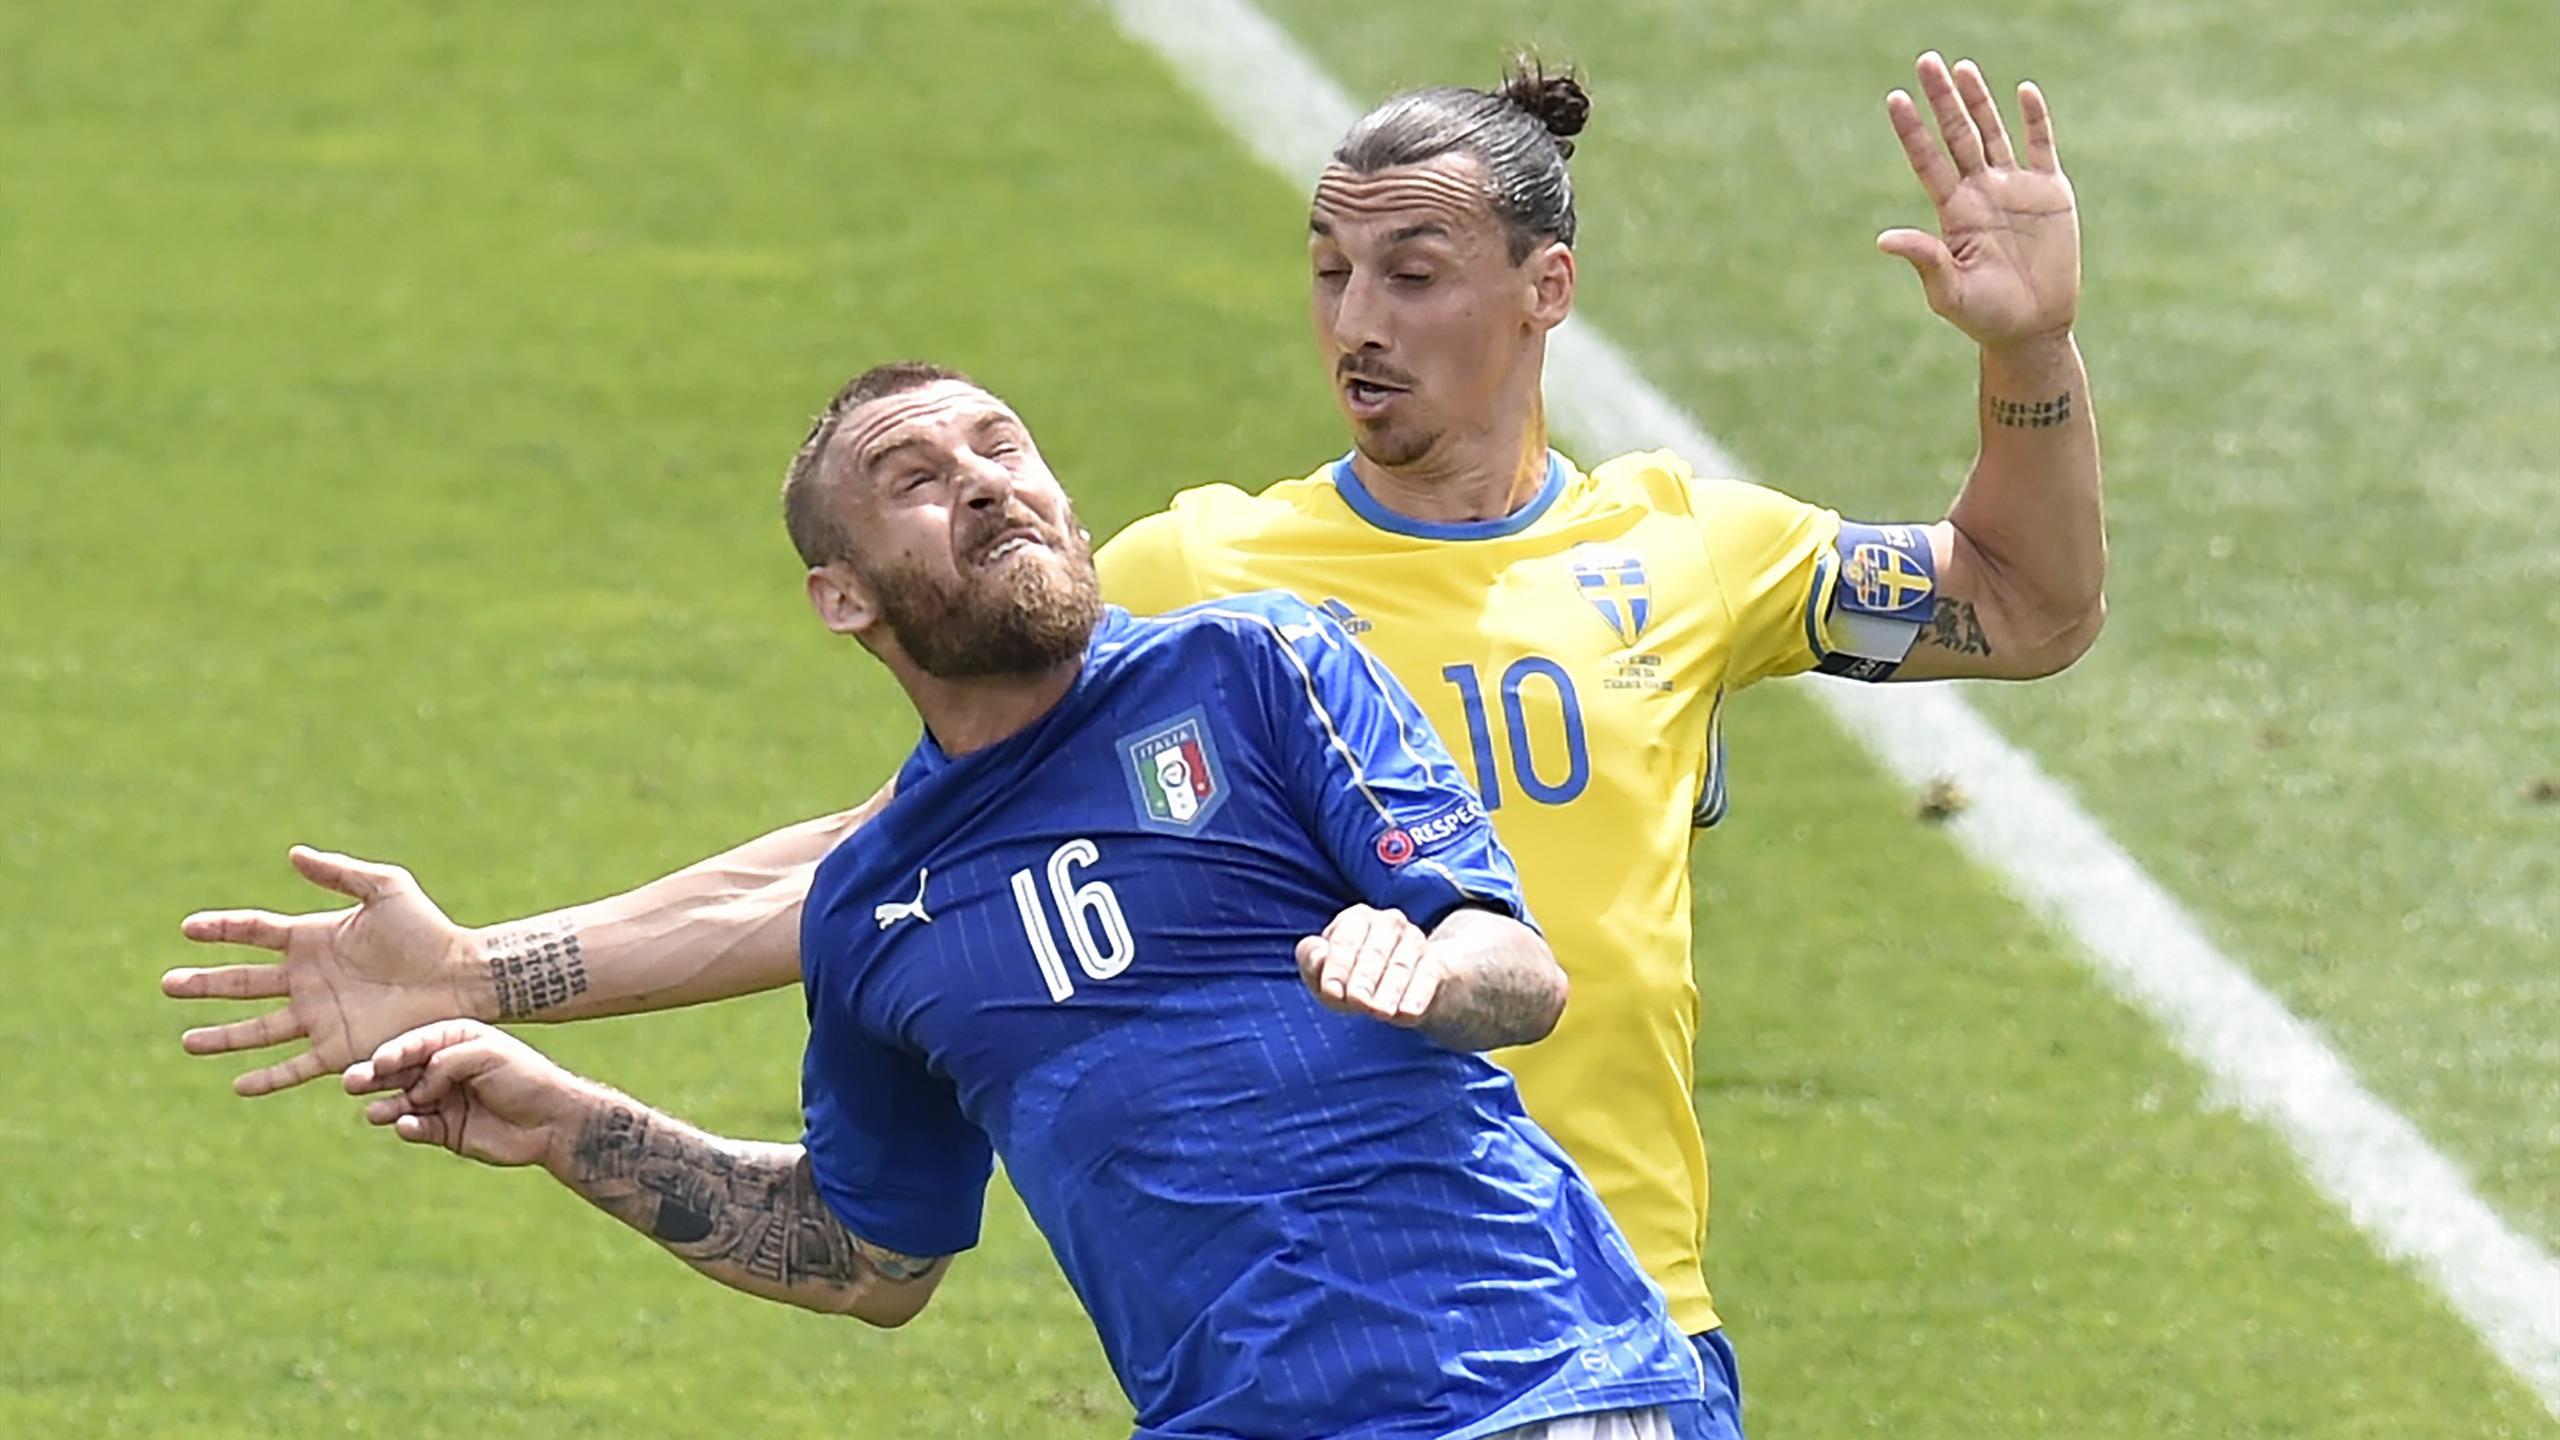 De Rossi Ibrahimovic - Italy v Sweden - Euro 2016